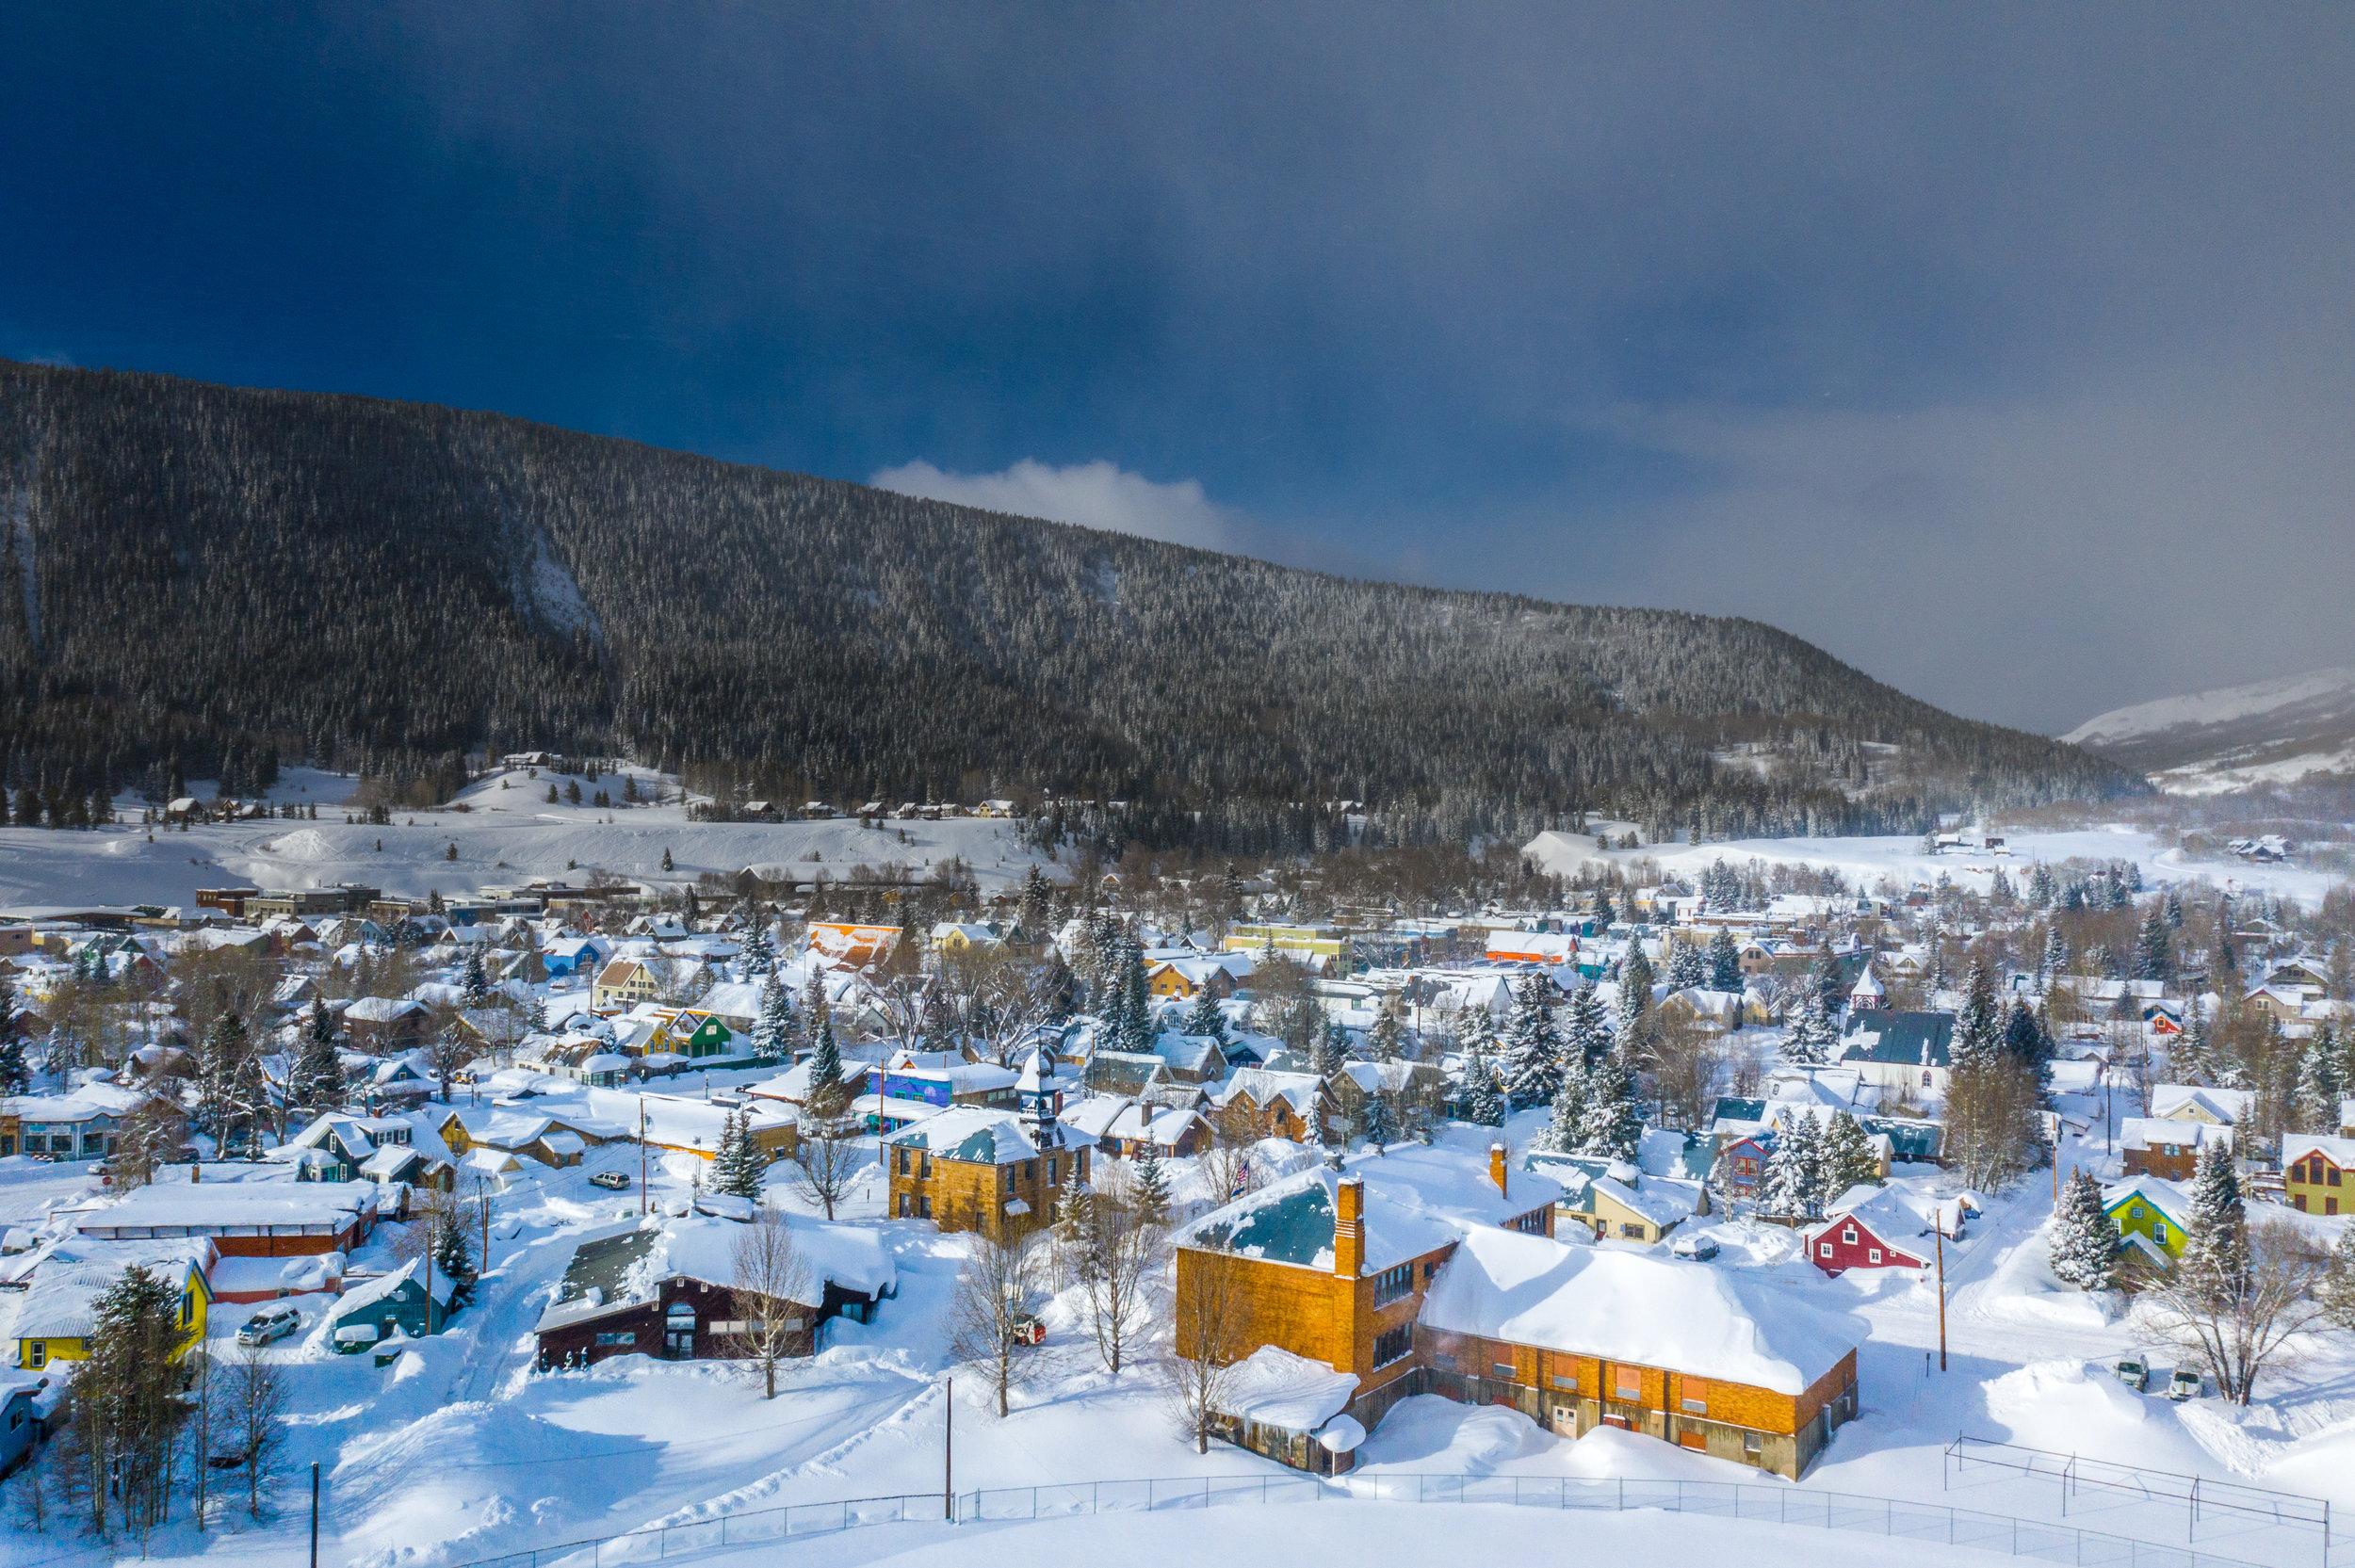 Town_Snow-0525.jpg